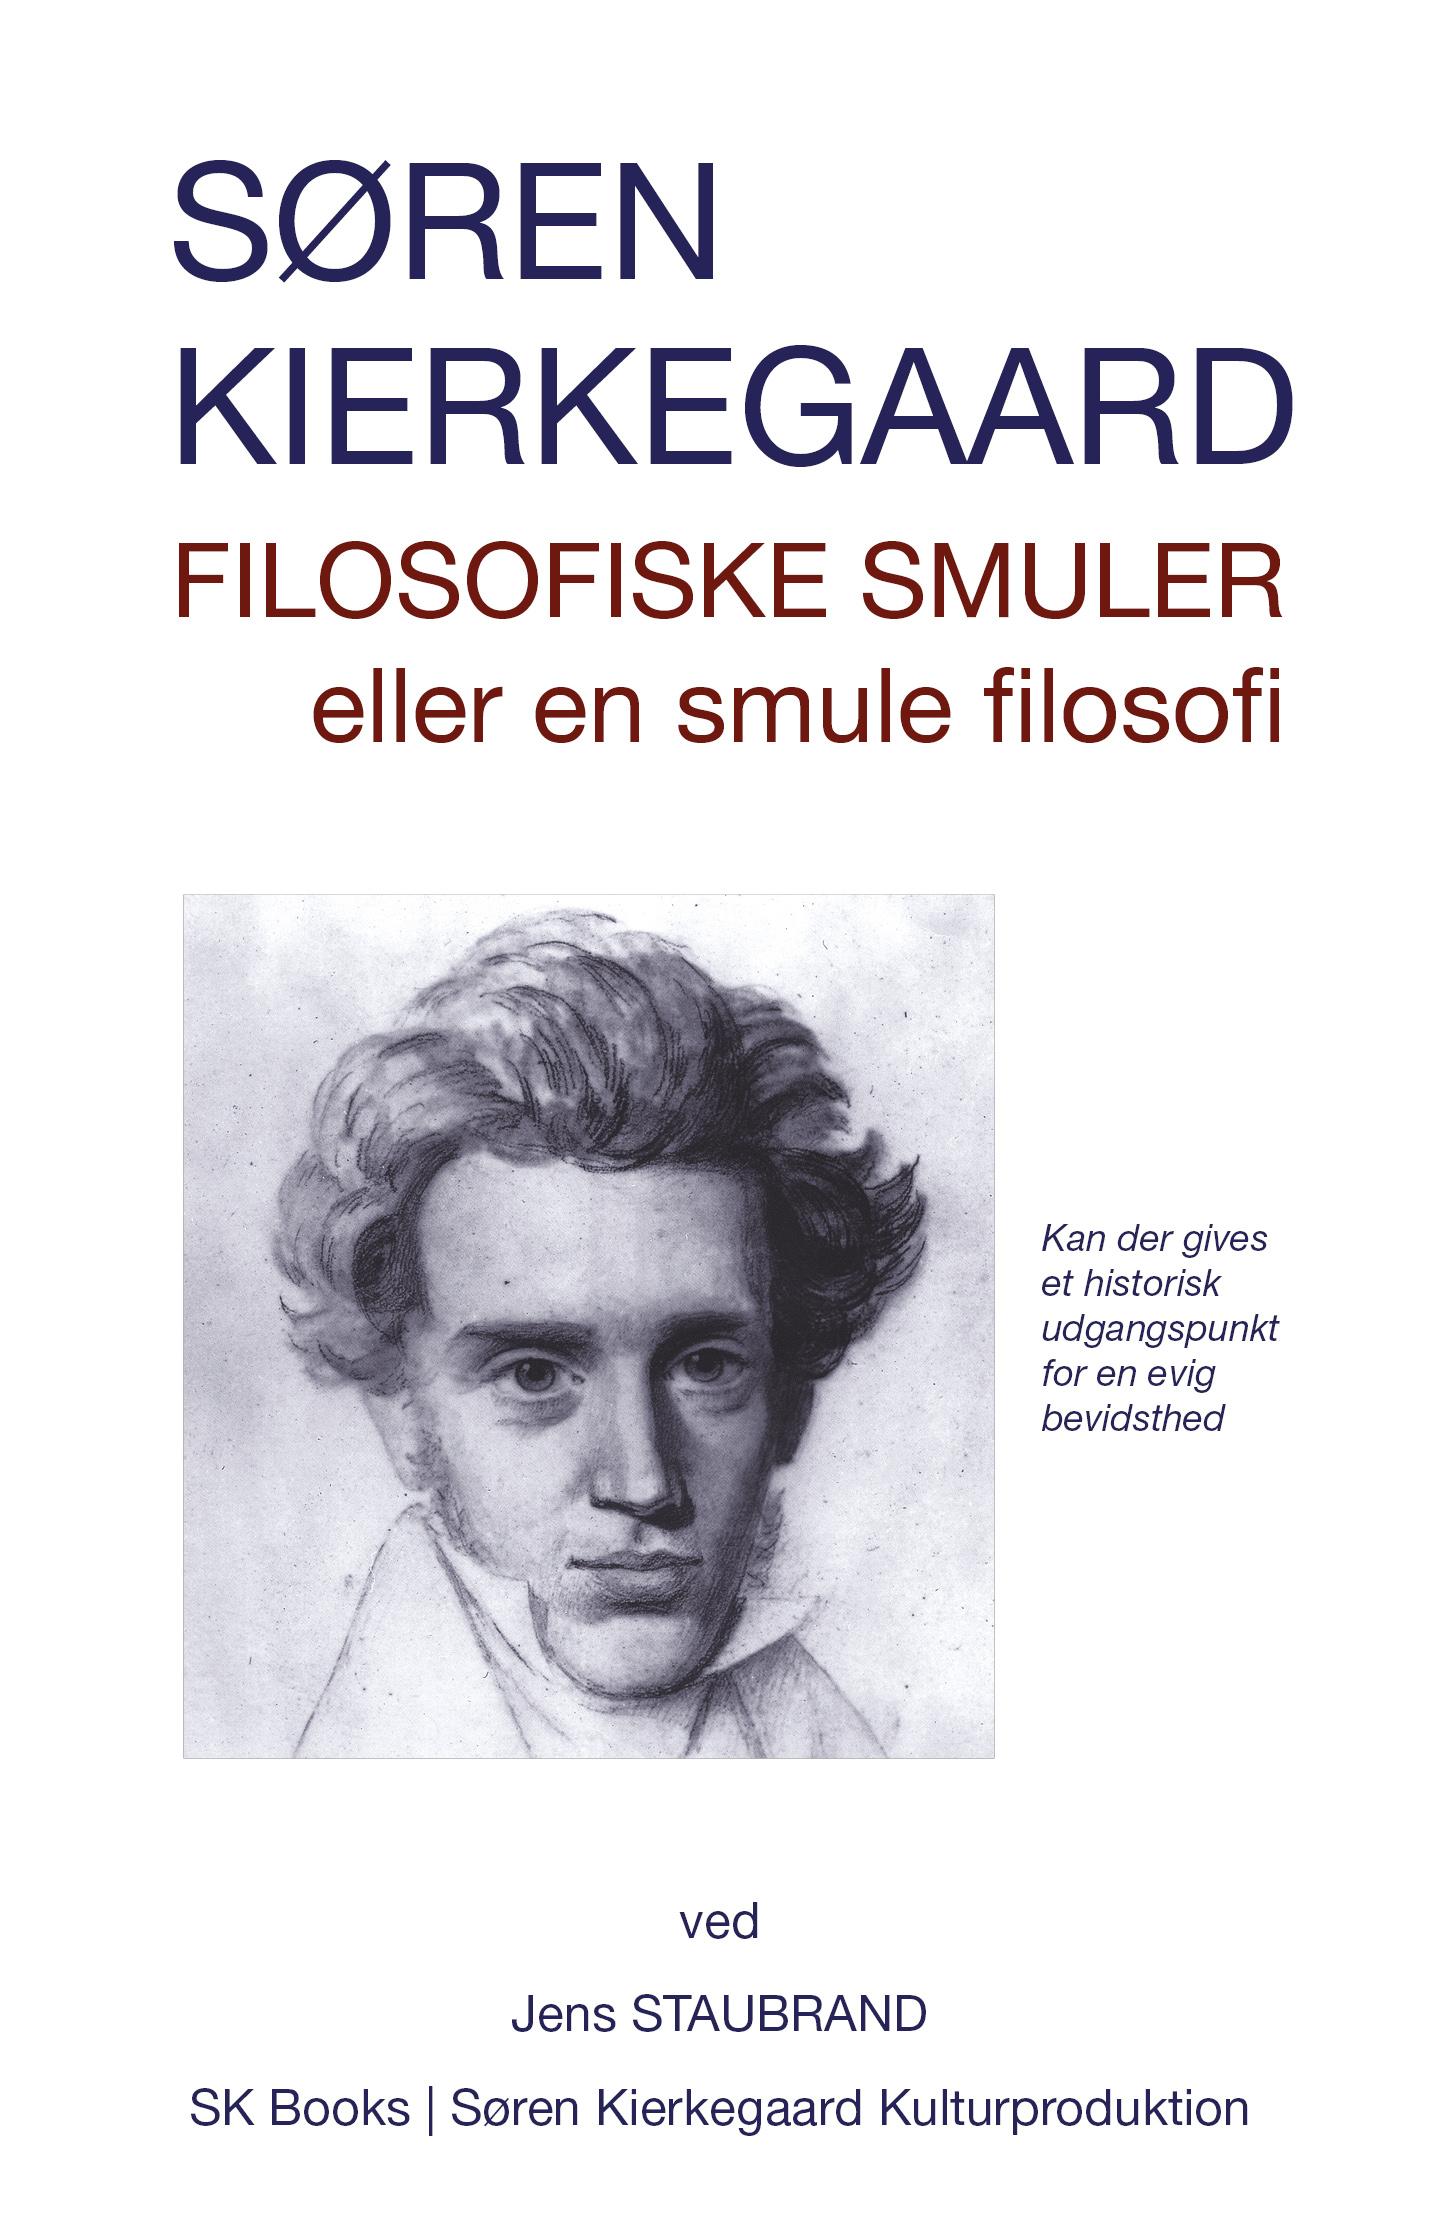 Søren Kierkegaard: Filosofiske smuler eller en smule filosofi, ved Jens Staubrand